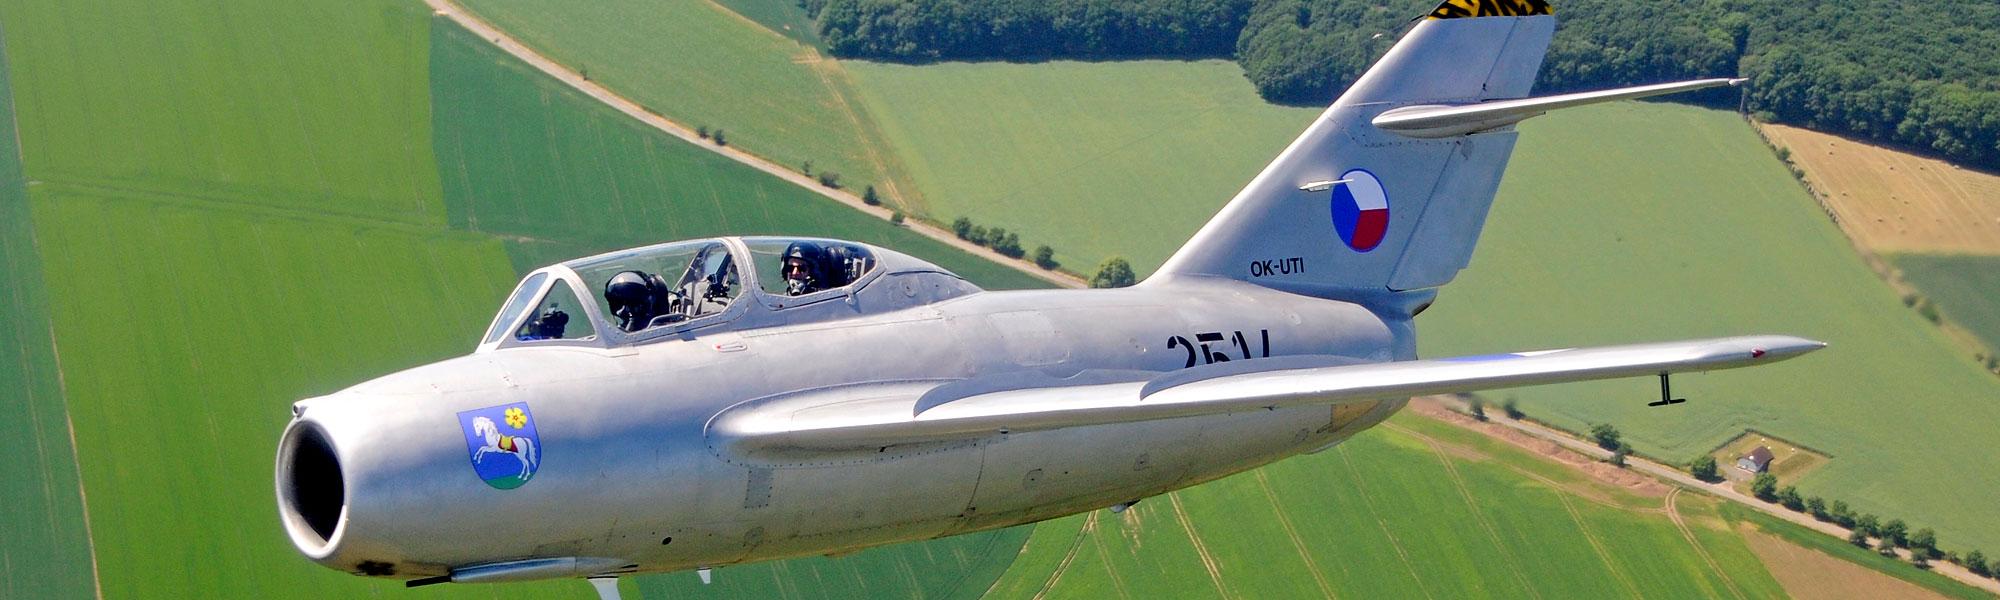 MiG-15 Fagot - Jet Warbird Legende